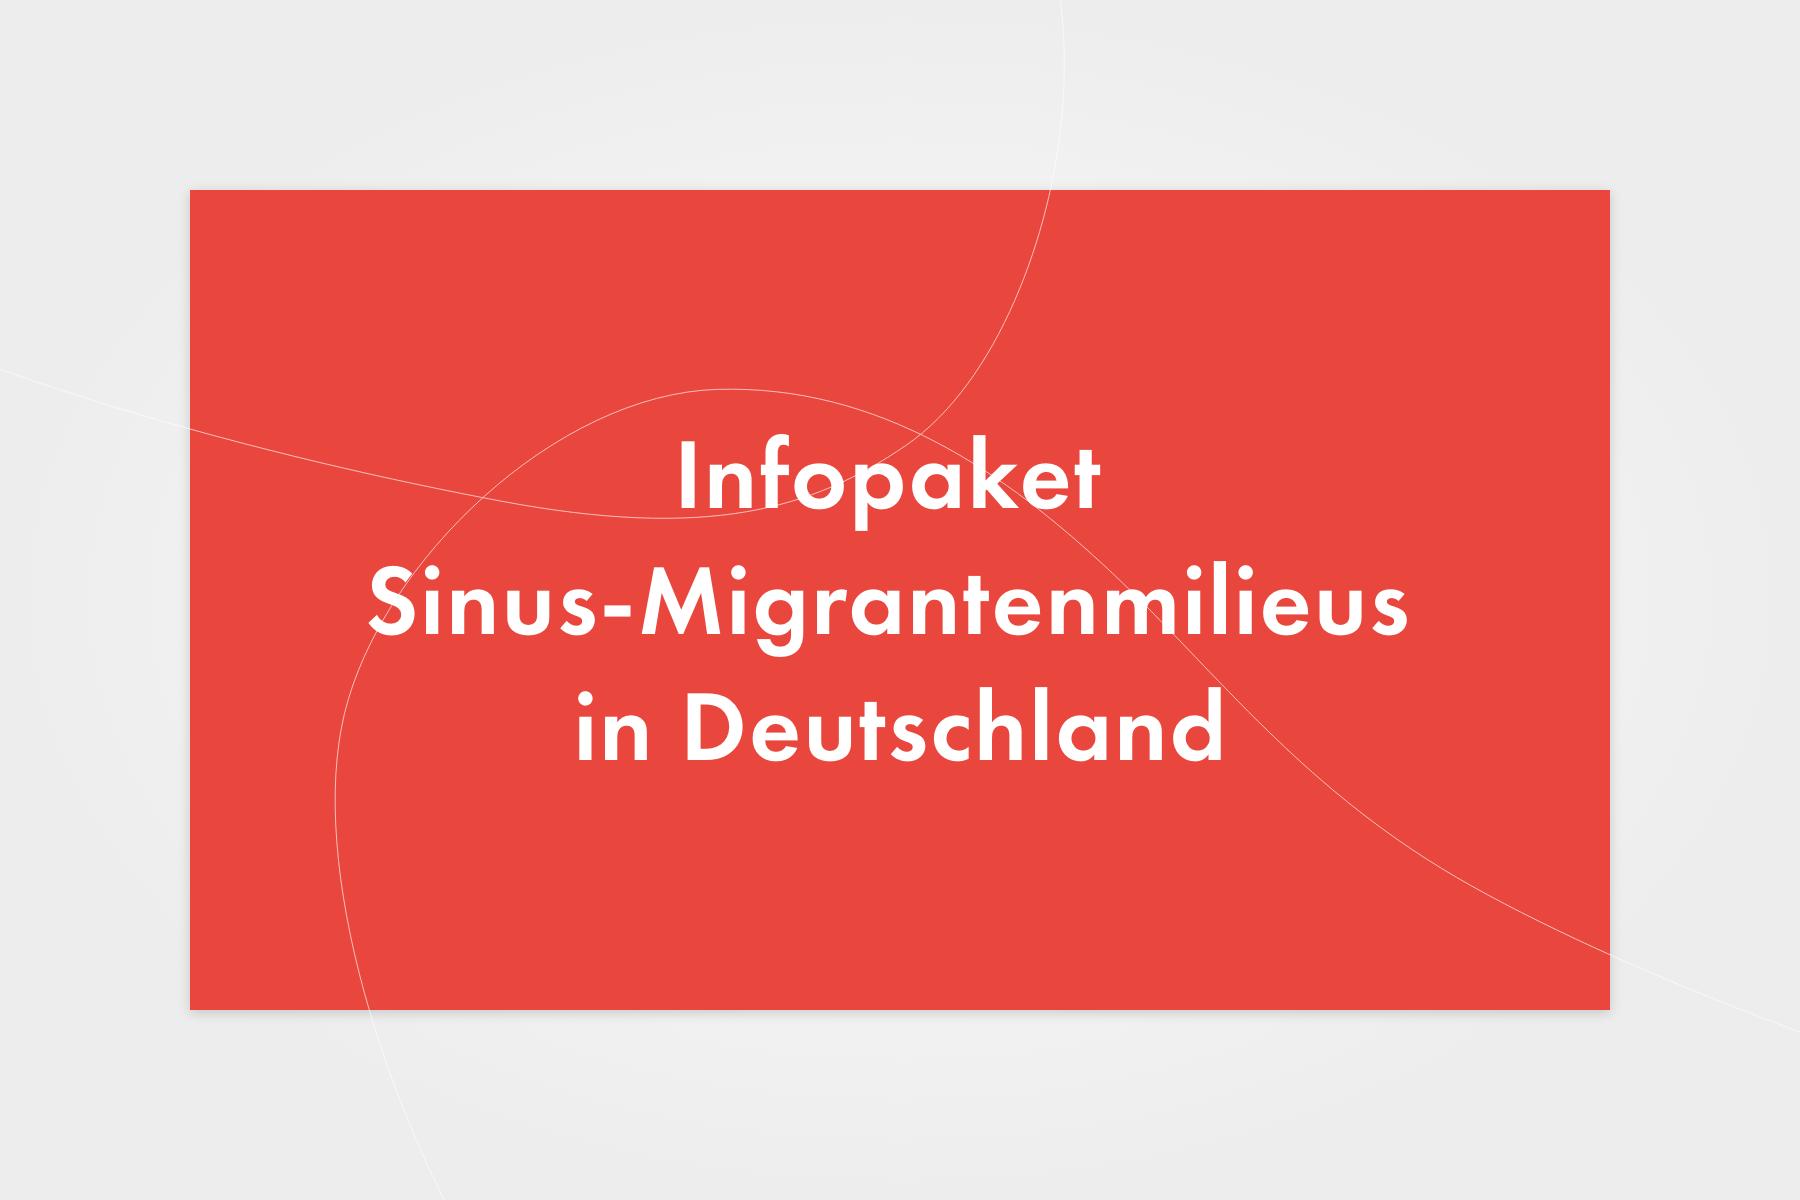 Sinus Infopaket Sinus-Migrantenmilieus in Deutschland